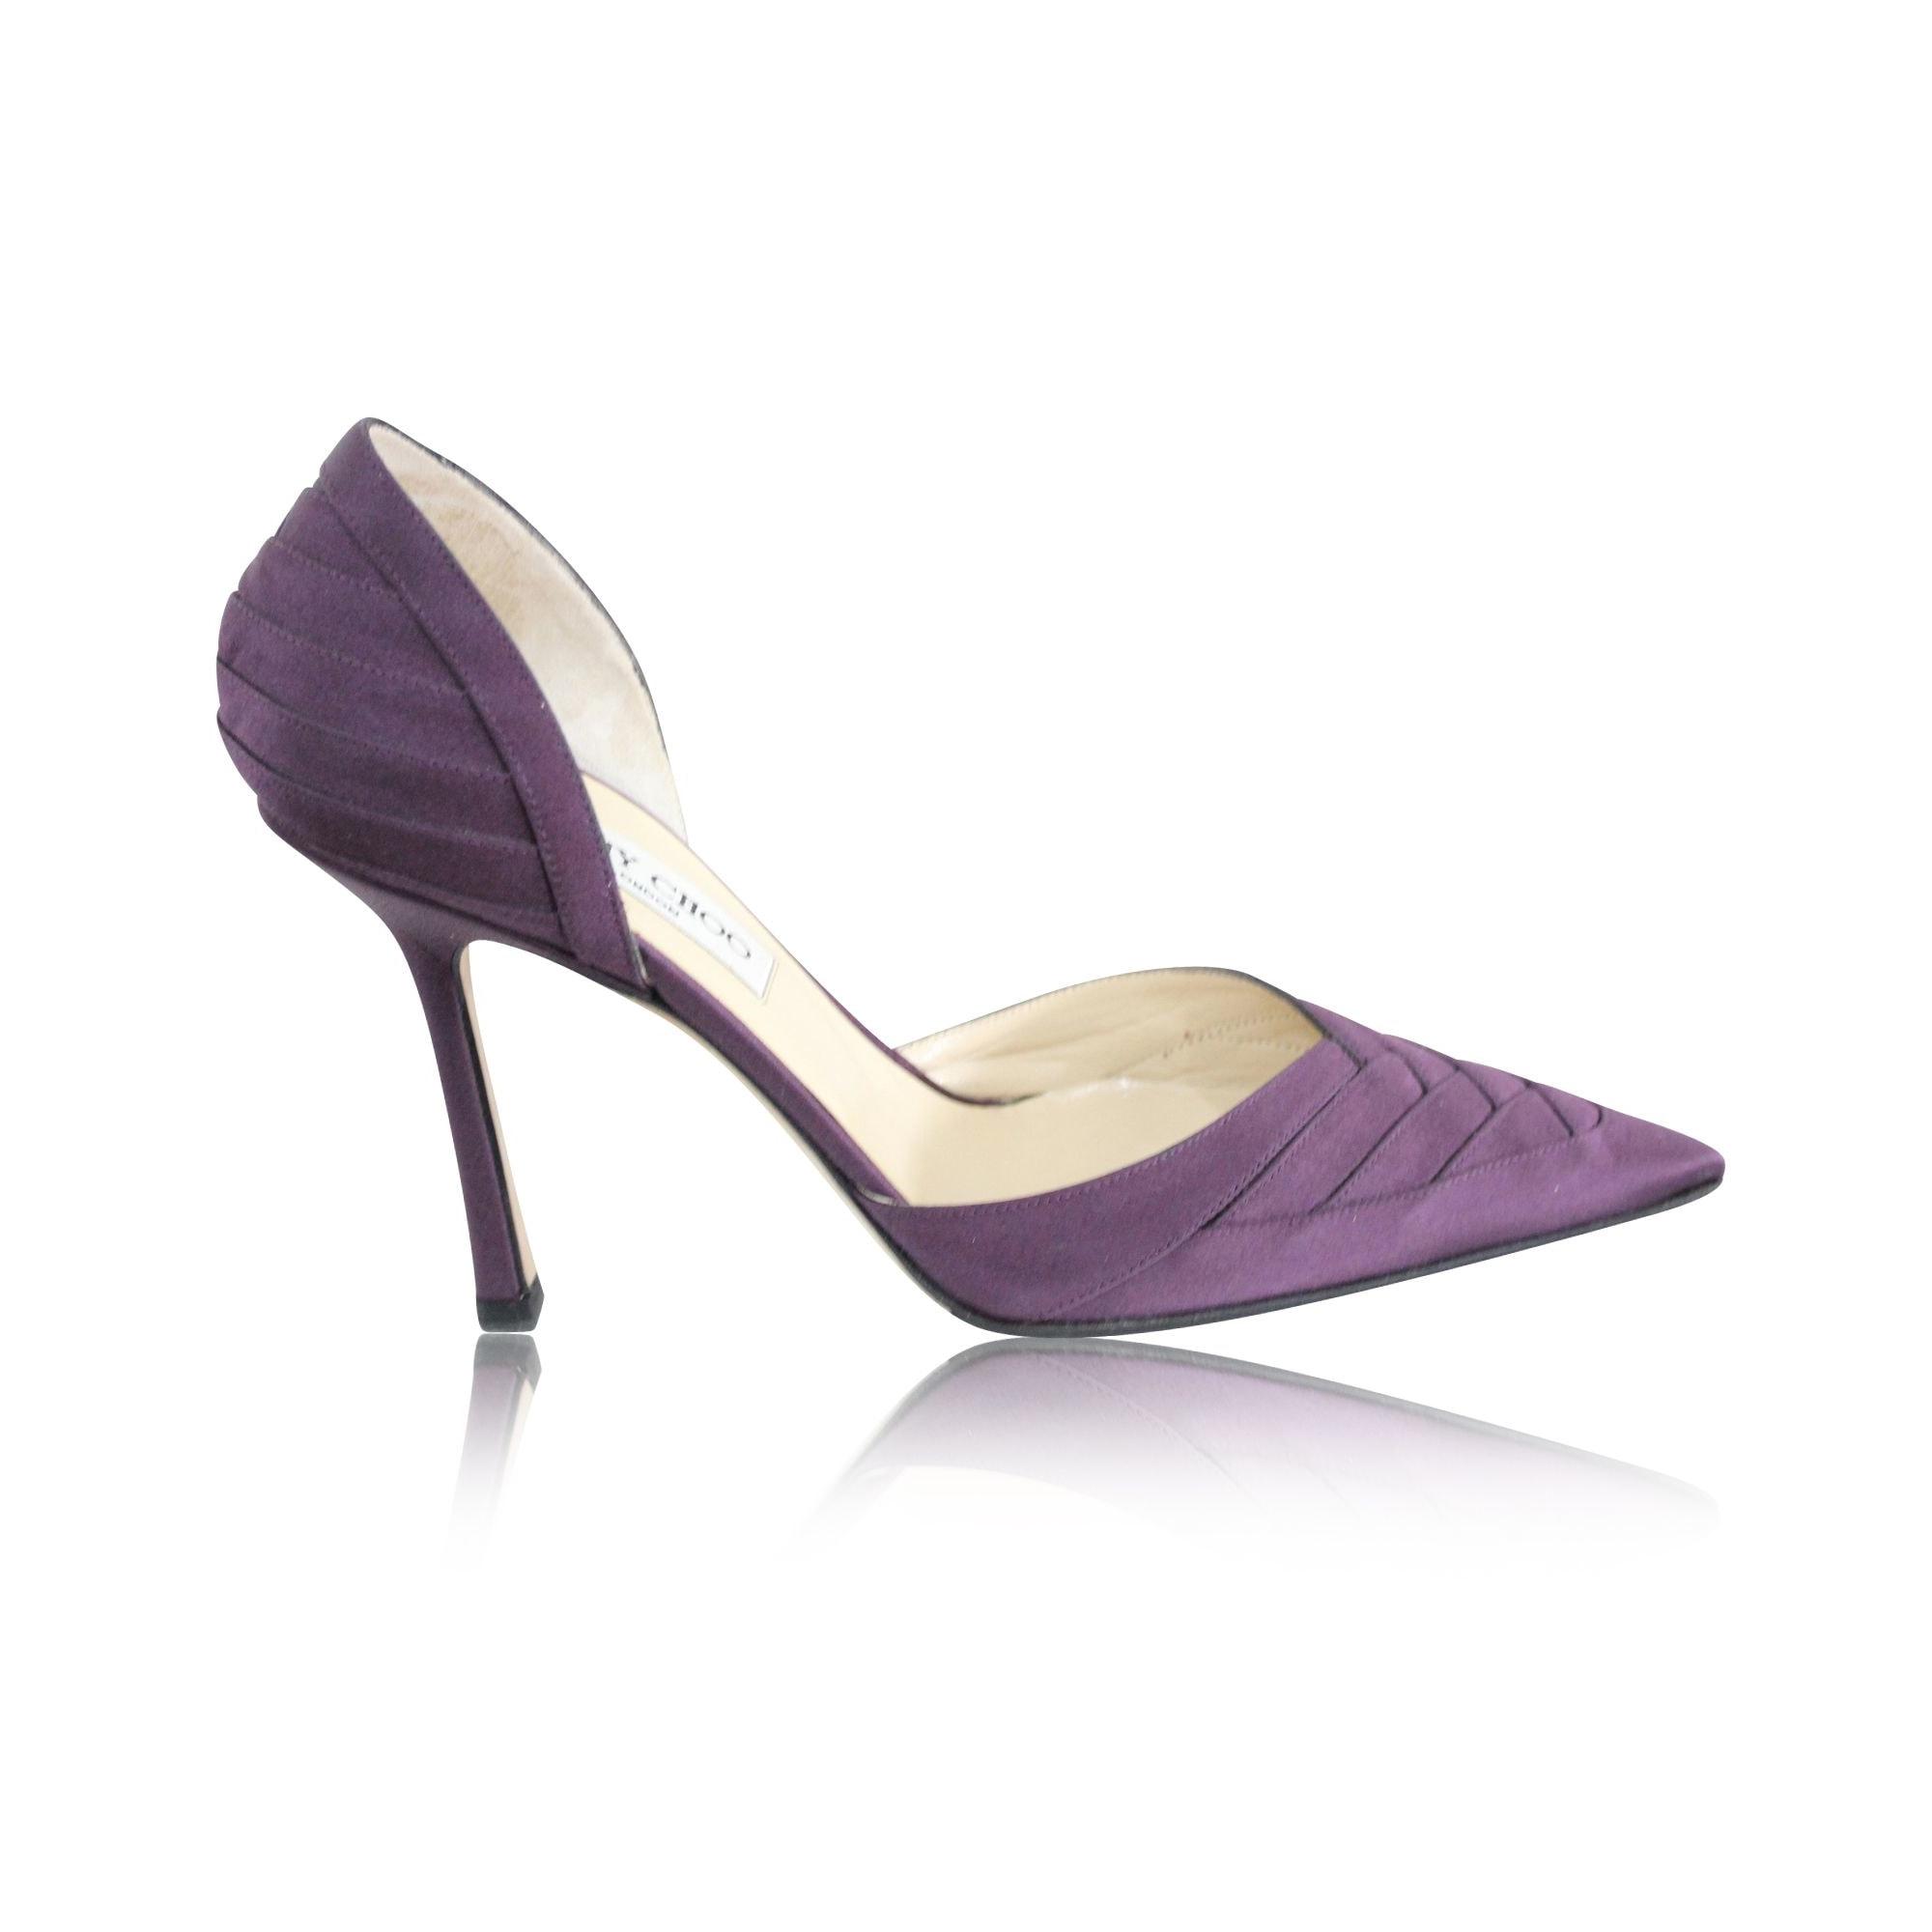 Peeptoes JIMMY CHOO Violett, malvenfarben, lavendelfarben